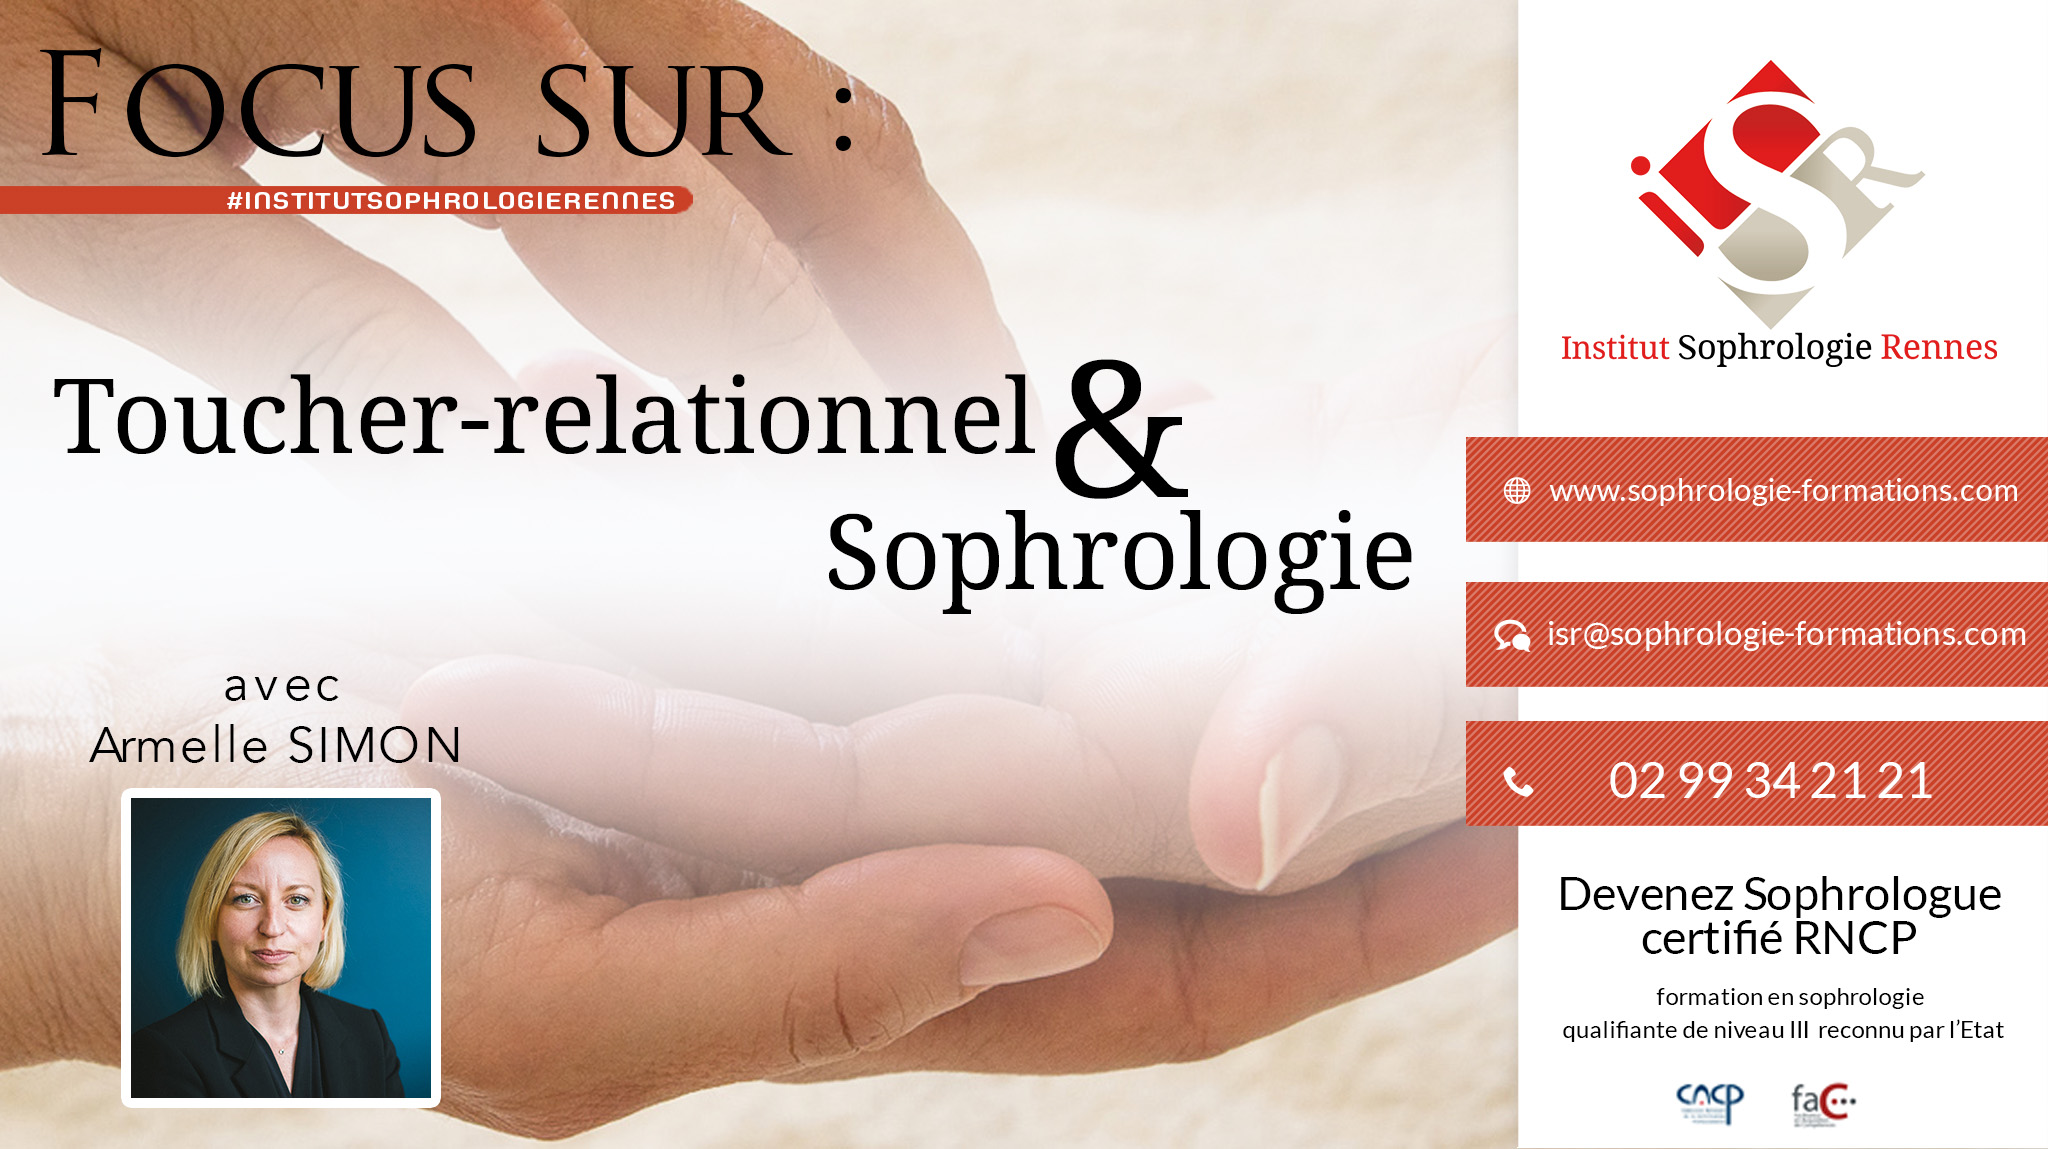 Focus sur Toucher-relationnel et sophrologie - ISR